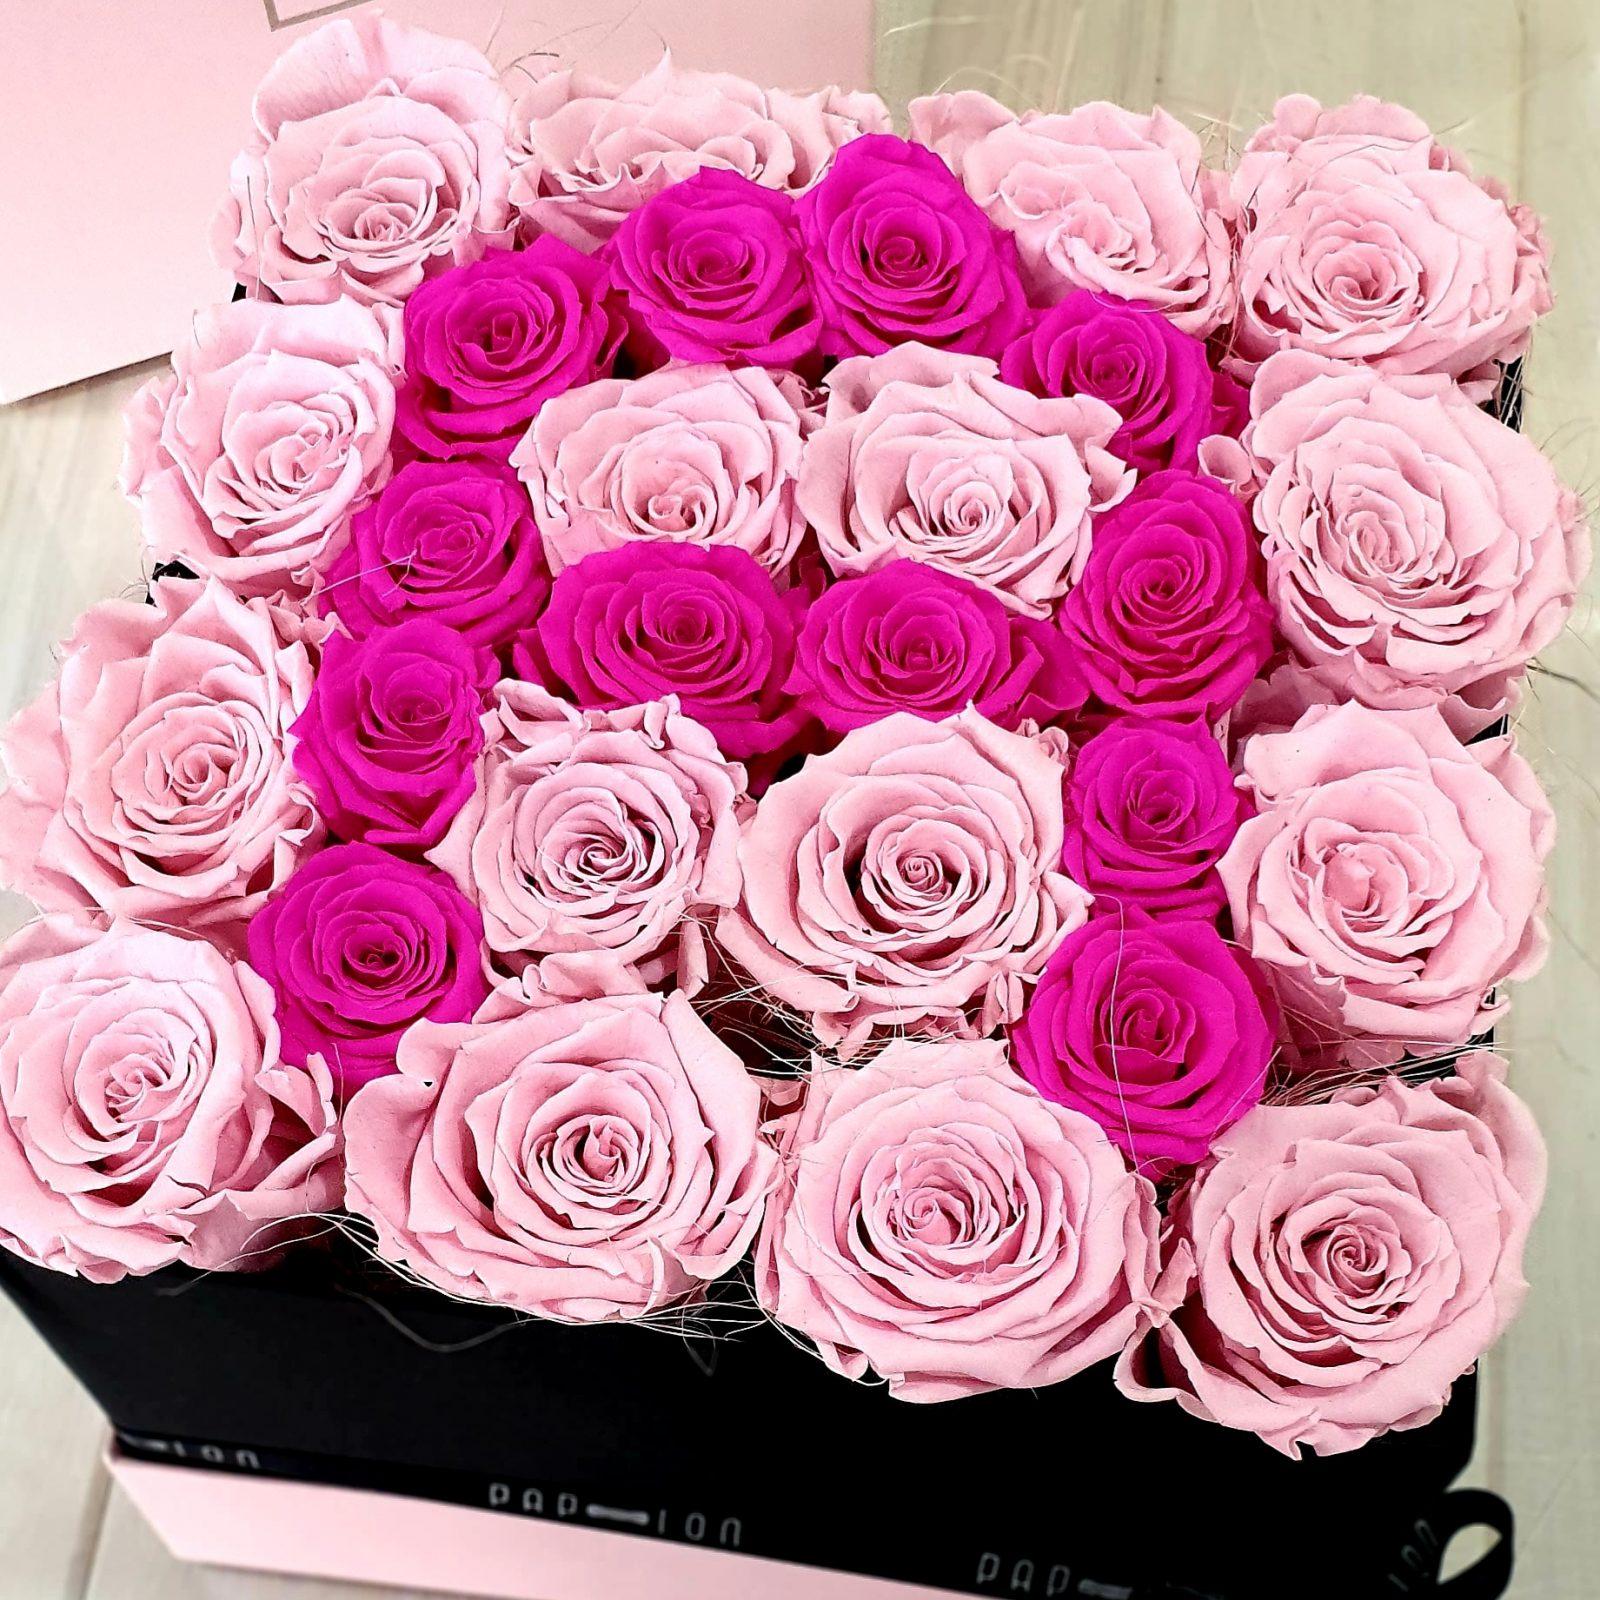 lettera- A- rose- rosa – fucsiastabilizzate – eterne